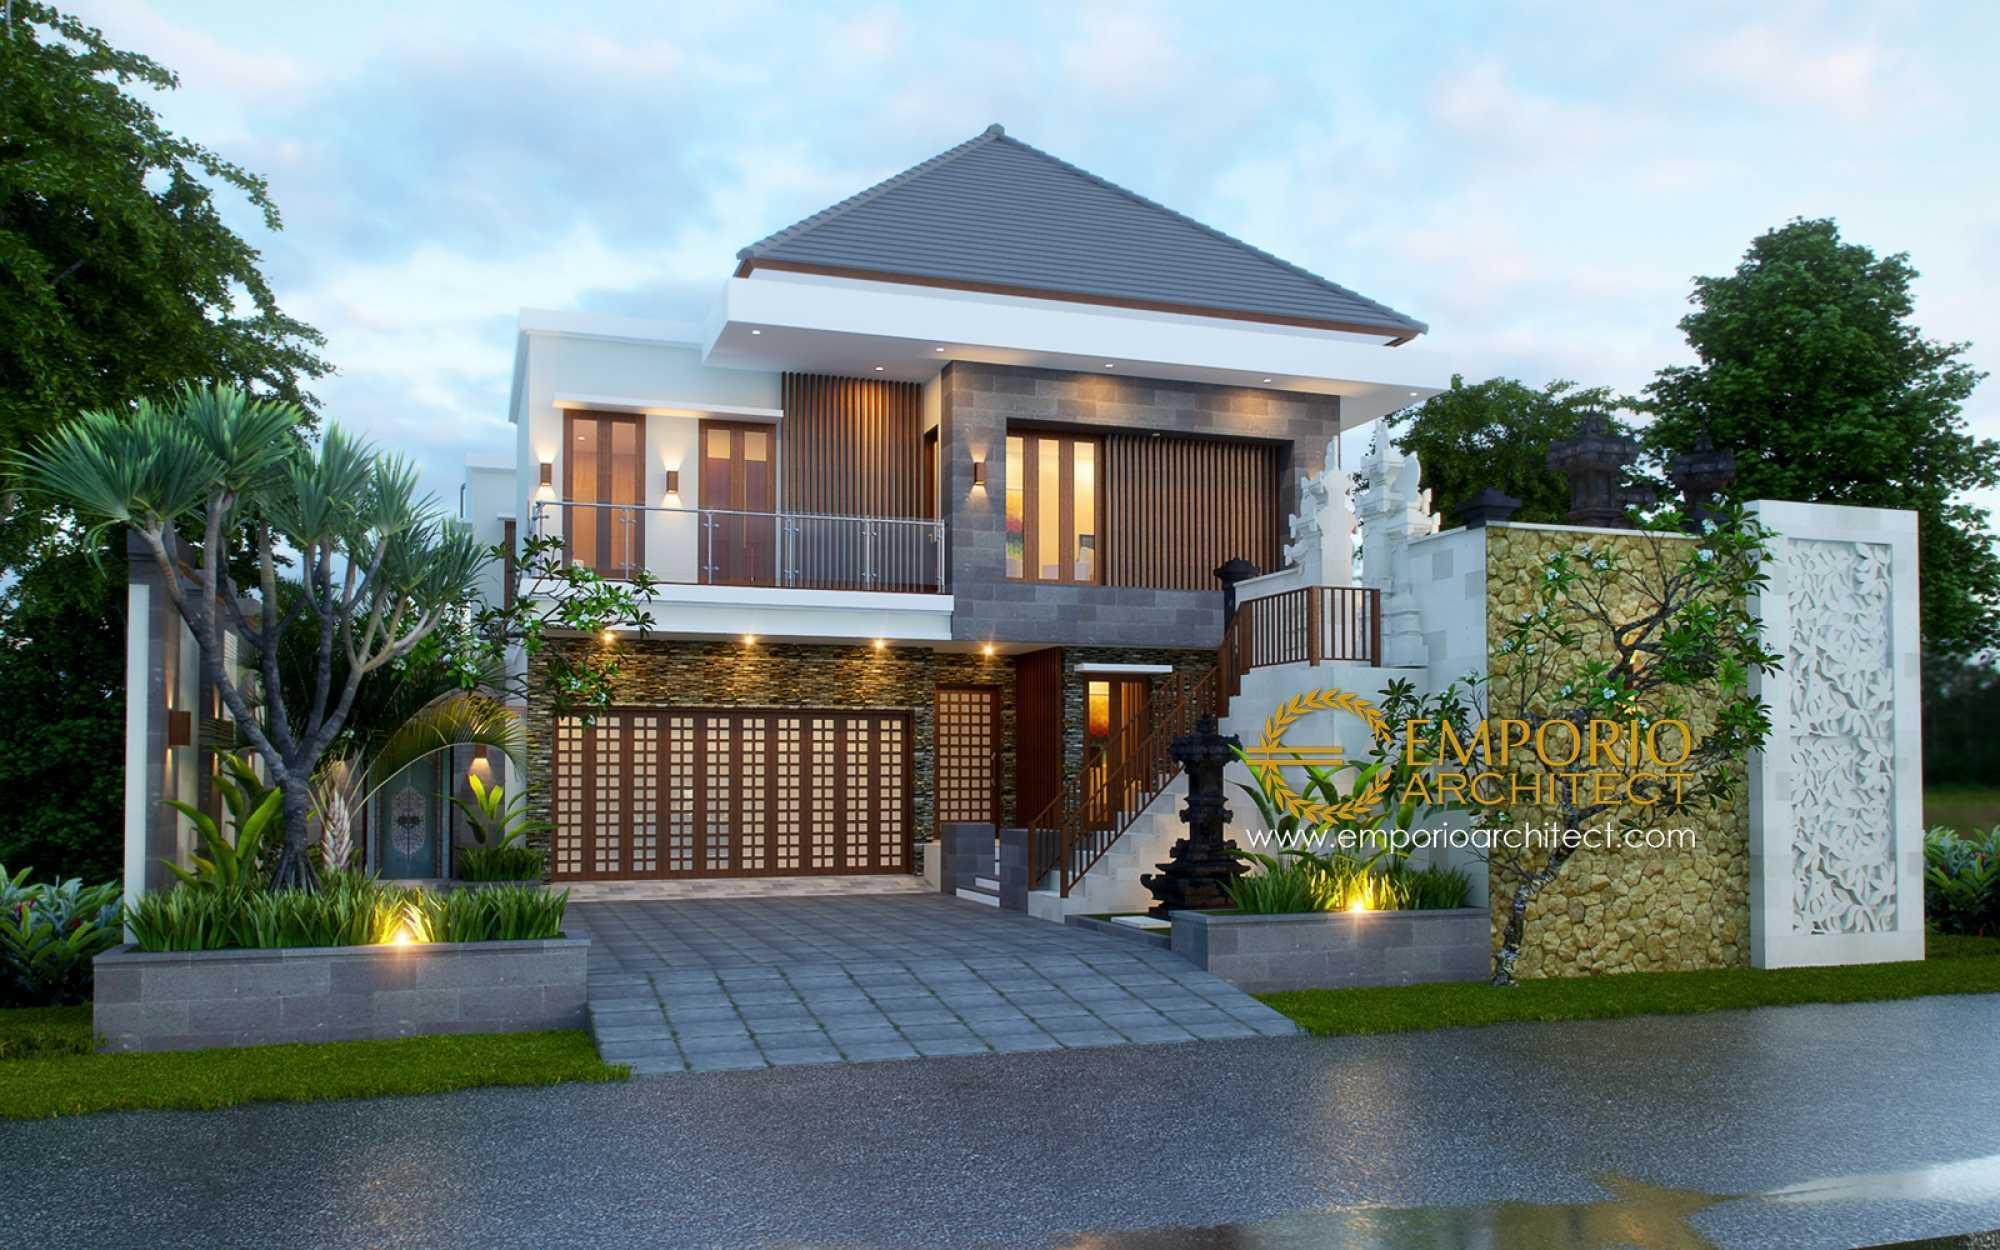 Emporio Architect Desain Rumah Villa Bali Tropis 380 @ Denpasar, Bali Kota Denpasar, Bali, Indonesia Kota Denpasar, Bali, Indonesia Emporio-Architect-Desain-Rumah-Villa-Bali-Tropis-380-Denpasar-Bali Modern 76374